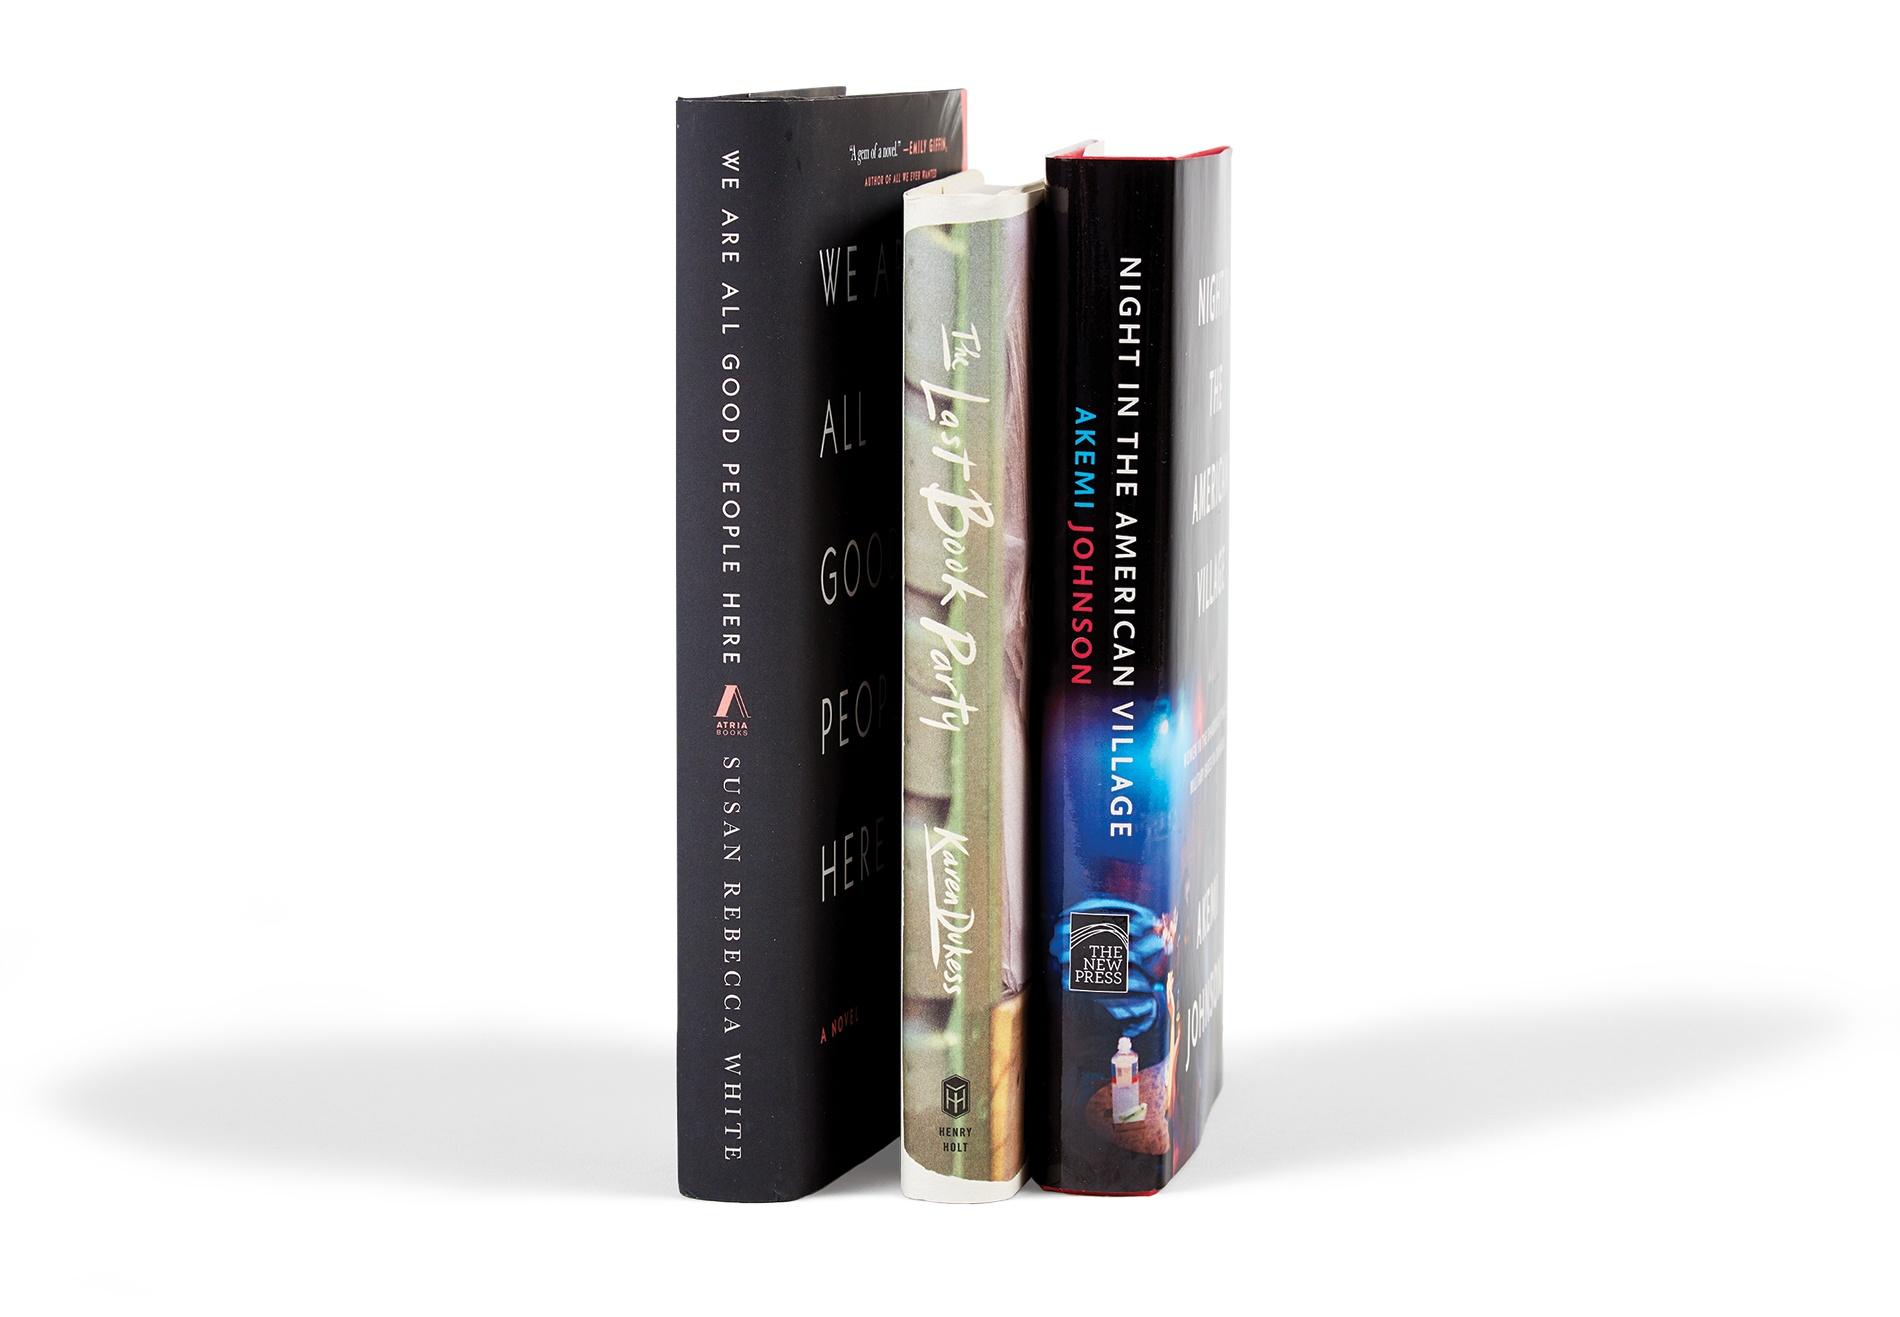 Image of books by Karen Dukess '84, Akemi Johnson '04, and Susan Rebecca White '99